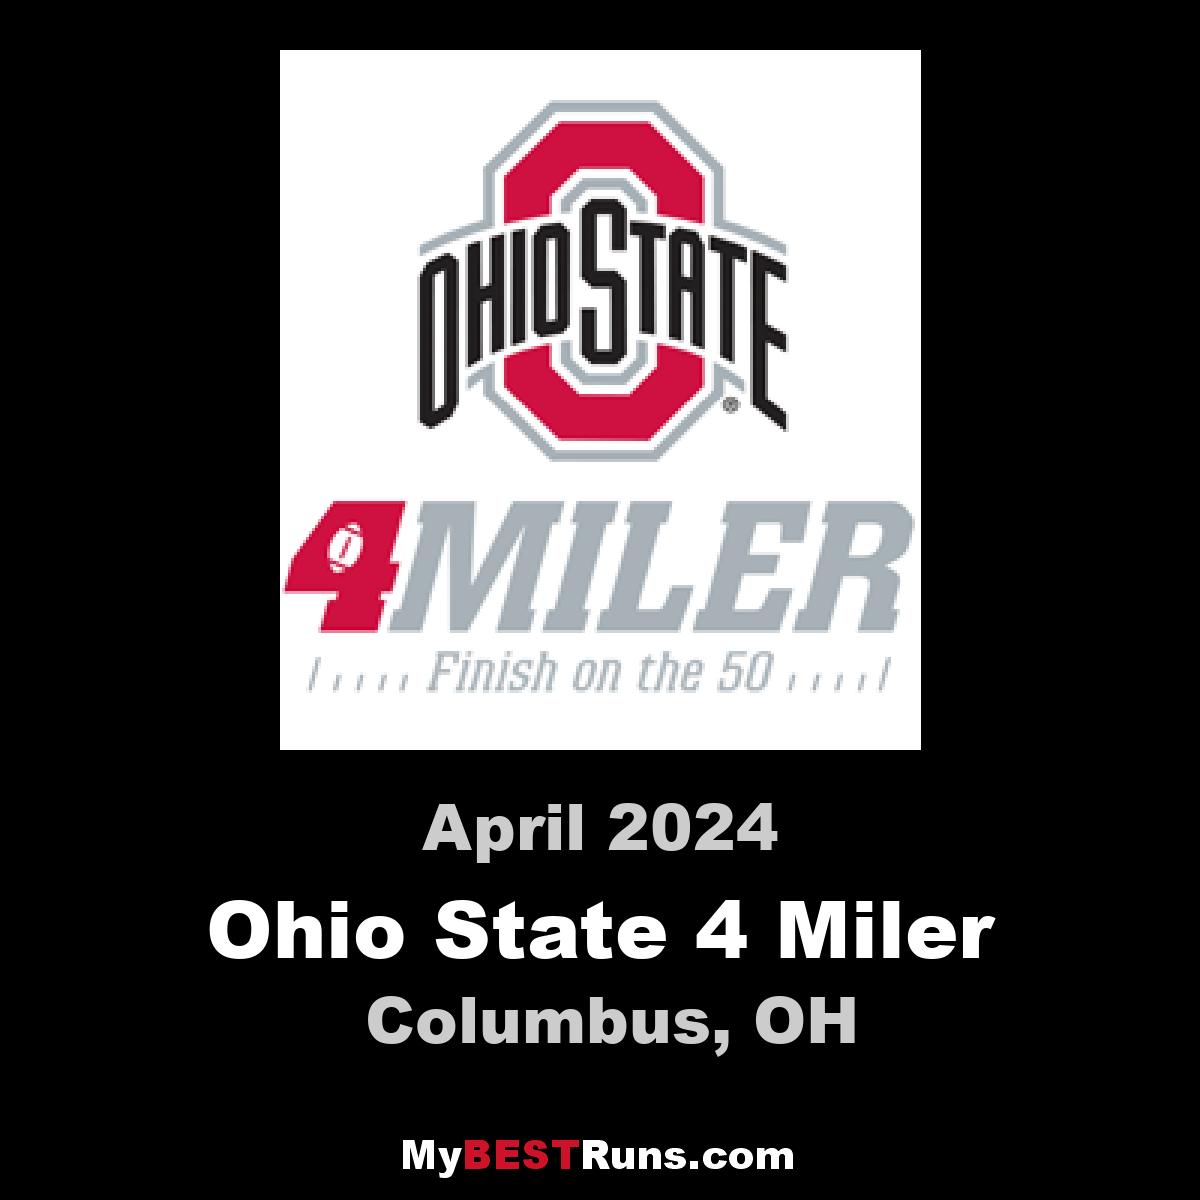 The Ohio State 4 Miler